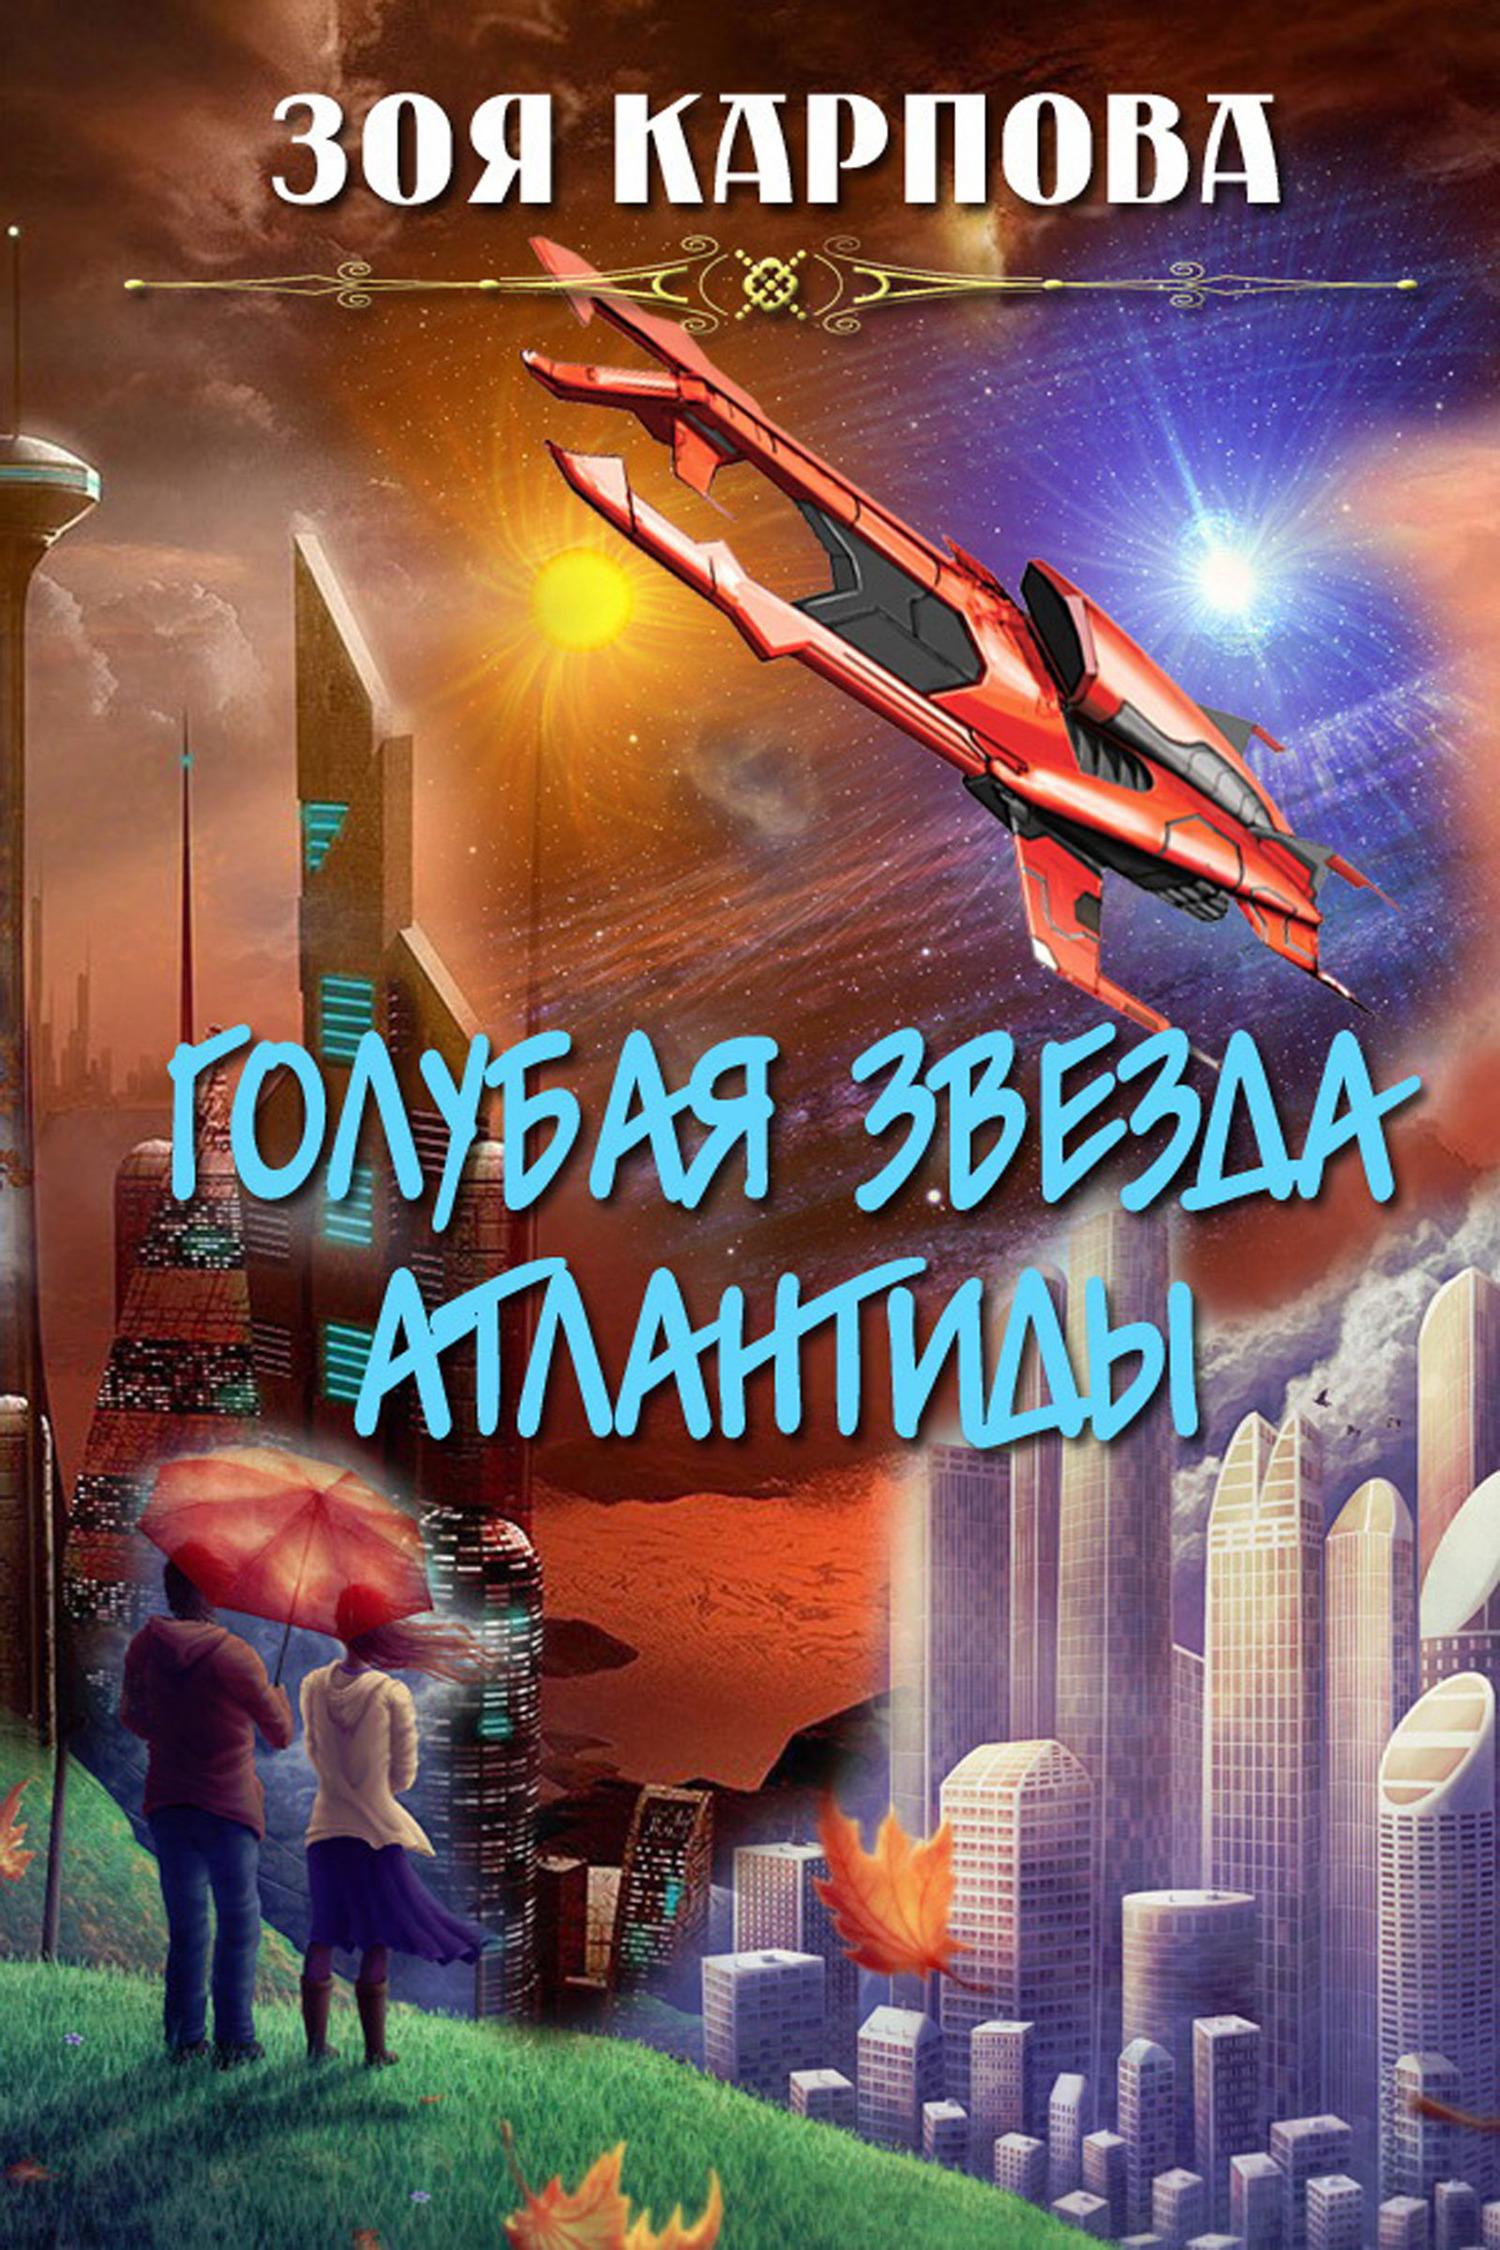 Зоя Карпова - Голубая звезда Атлантиды